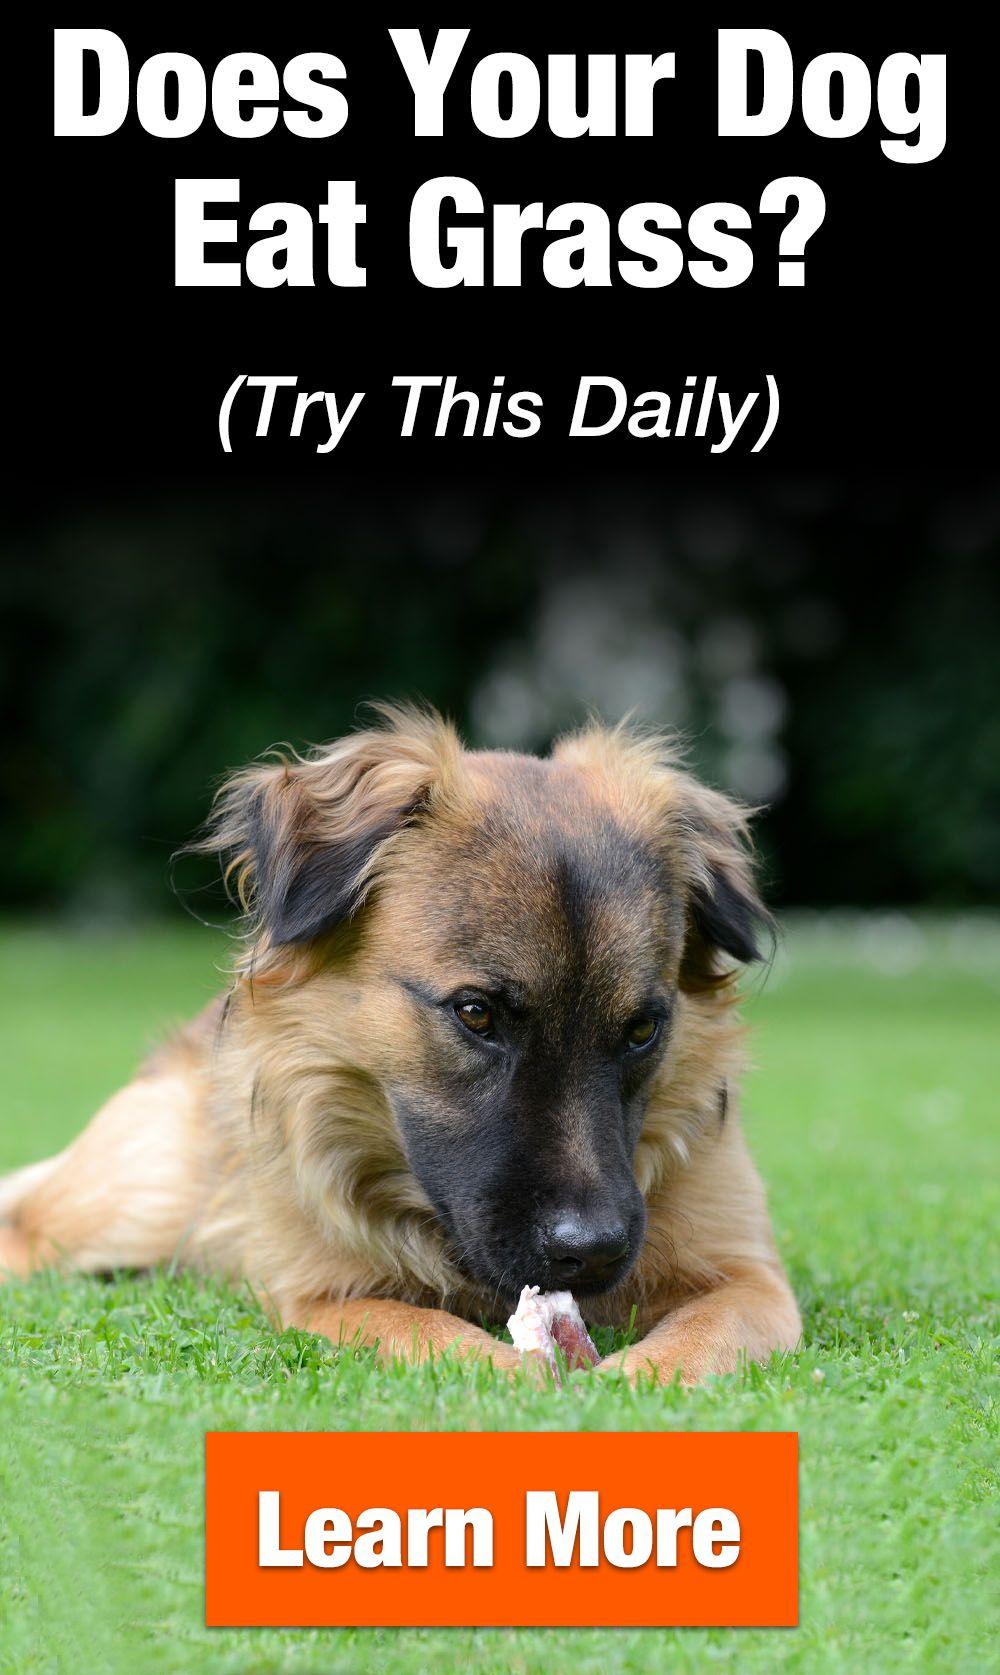 Vetriscience Renal Essentials Feline Supplement For Pets Check